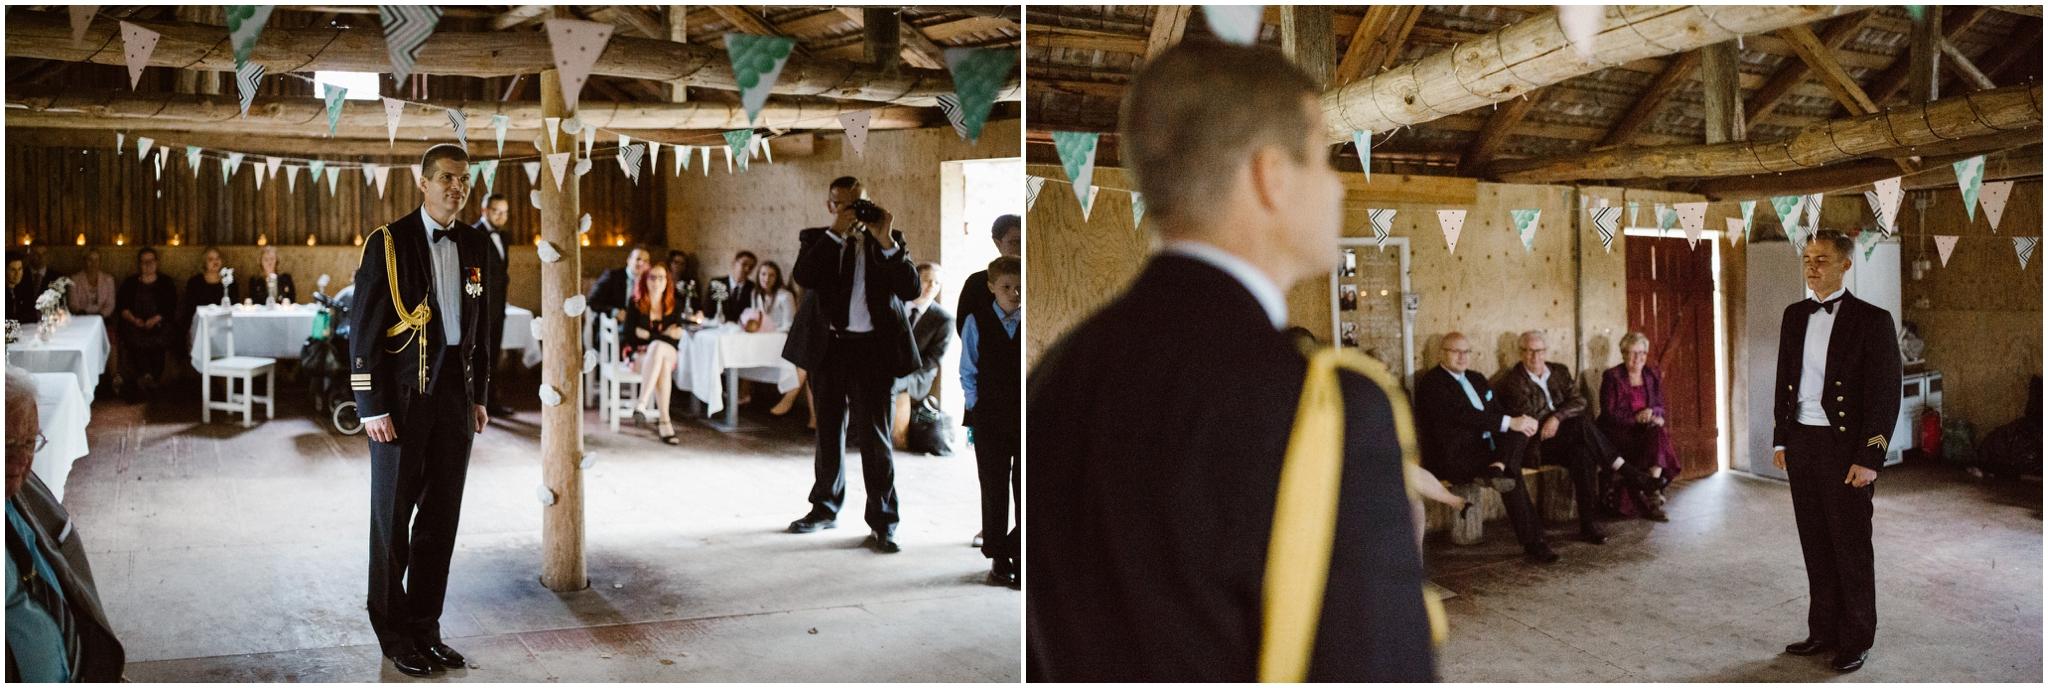 Pinja + Marko -- Patrick Karkkolainen Wedding Photographer-186.jpg